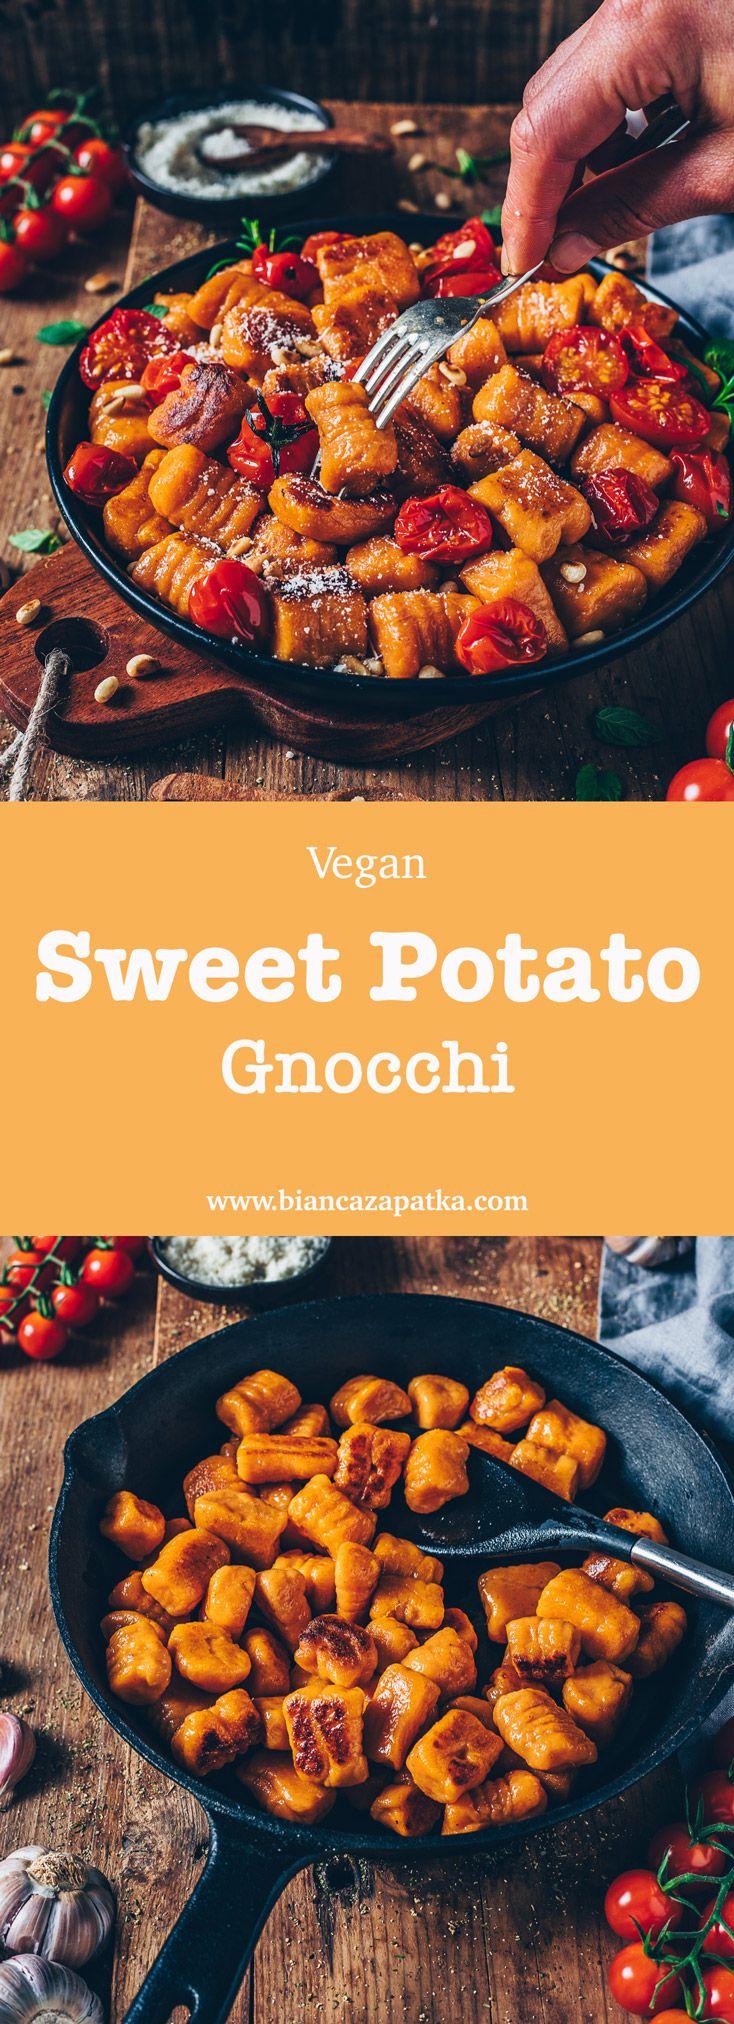 Vegan Sweet Potato Gnocchi (vegan, easy recipe) - Bianca Zapatka | Recipes